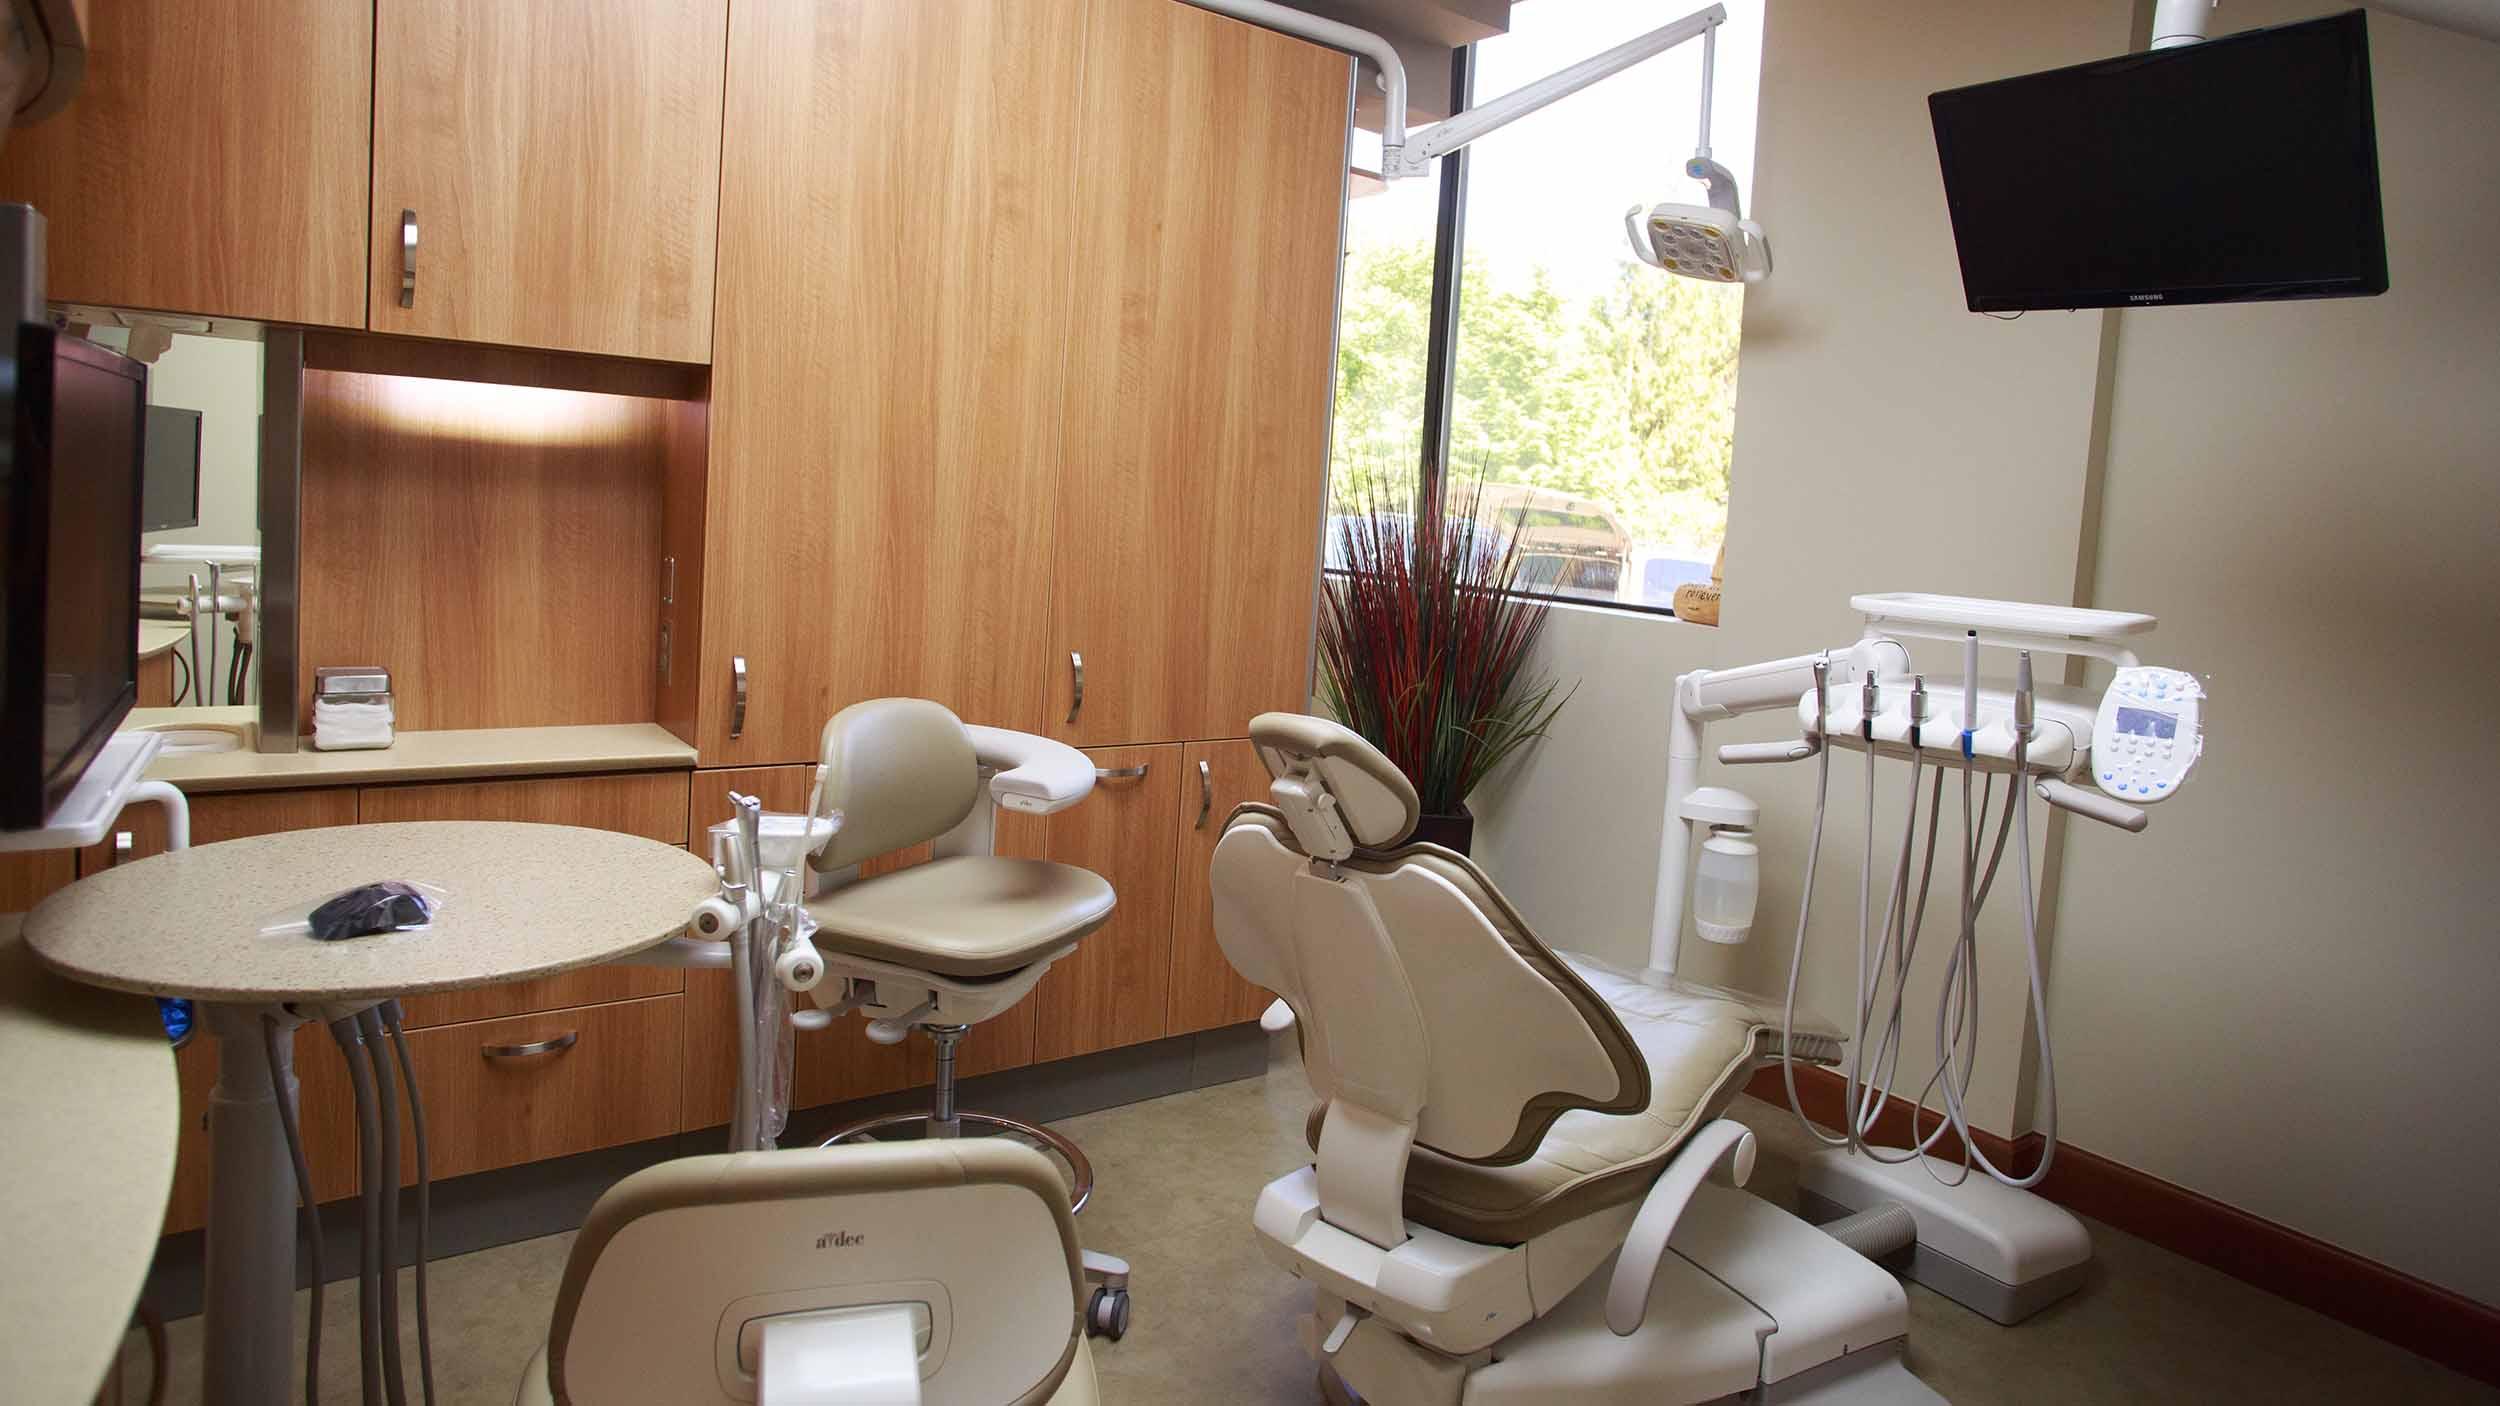 425 Dental Office Tour Web_0012_13-1621-DrOBldg.jpg